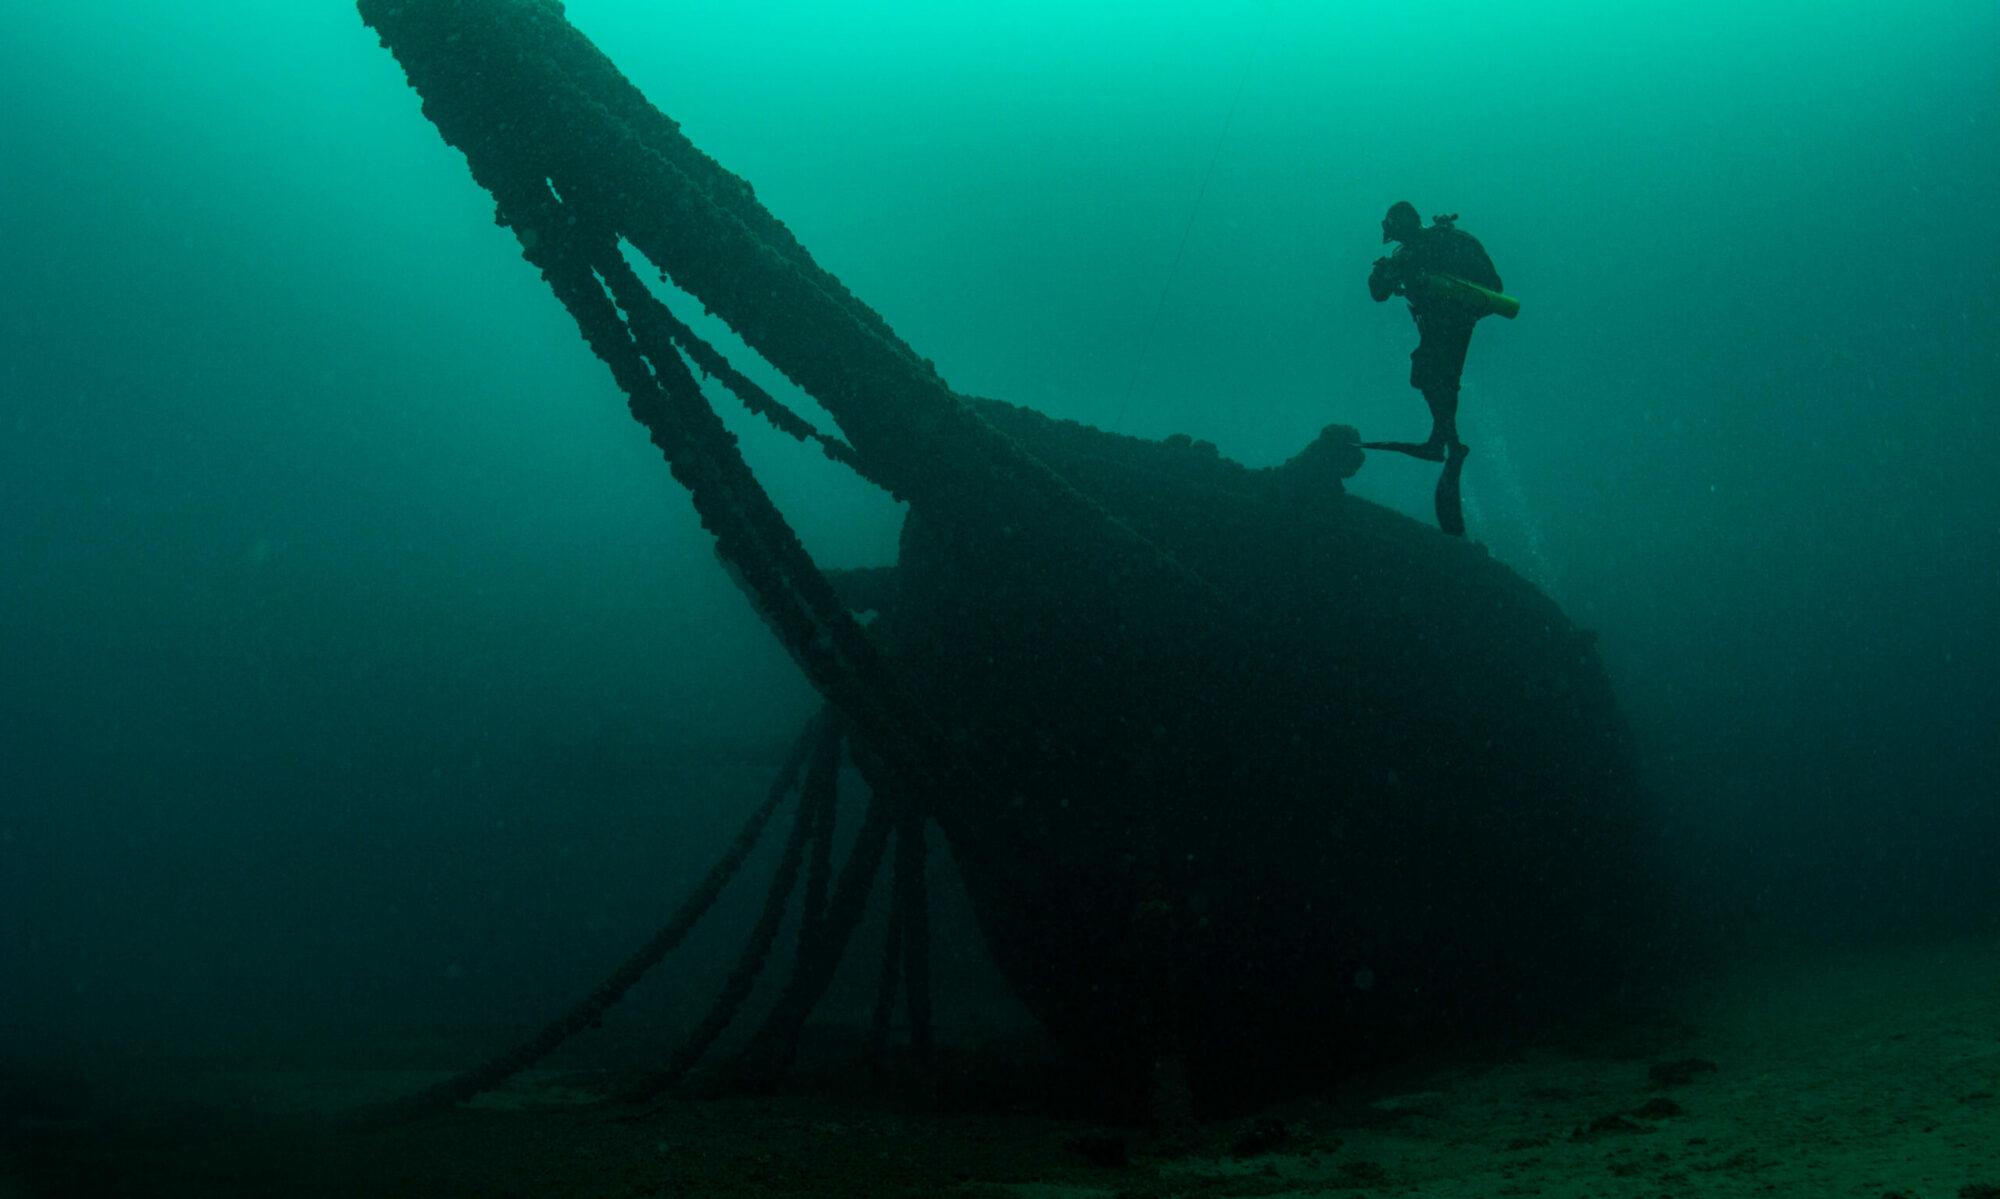 Great Lakes Shipwreck Festival